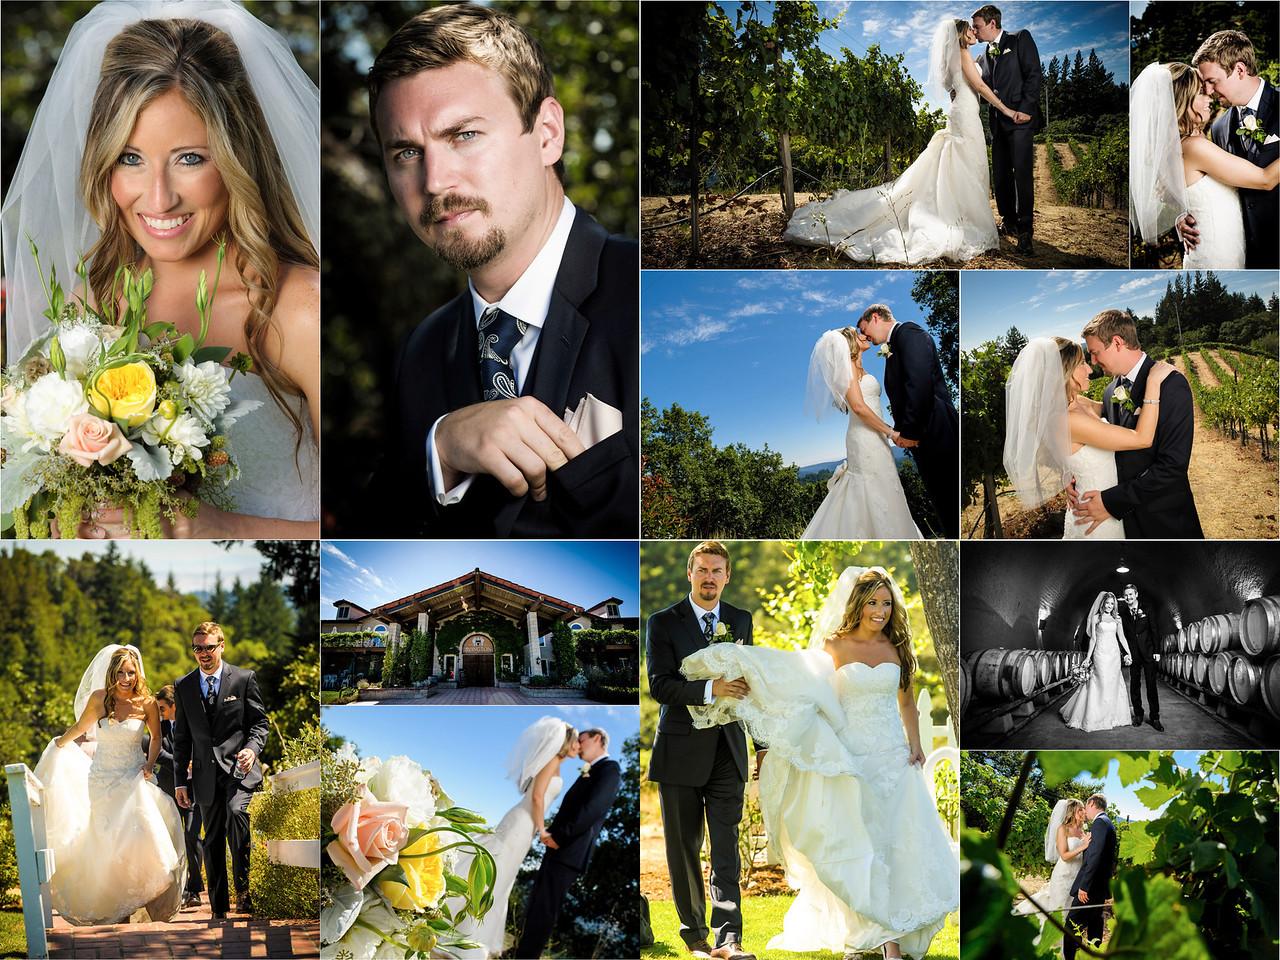 Erica_and_Justin_Byington_Winery_Los_Gatos_Wedding_Photography_4x6_Photo_Board_04